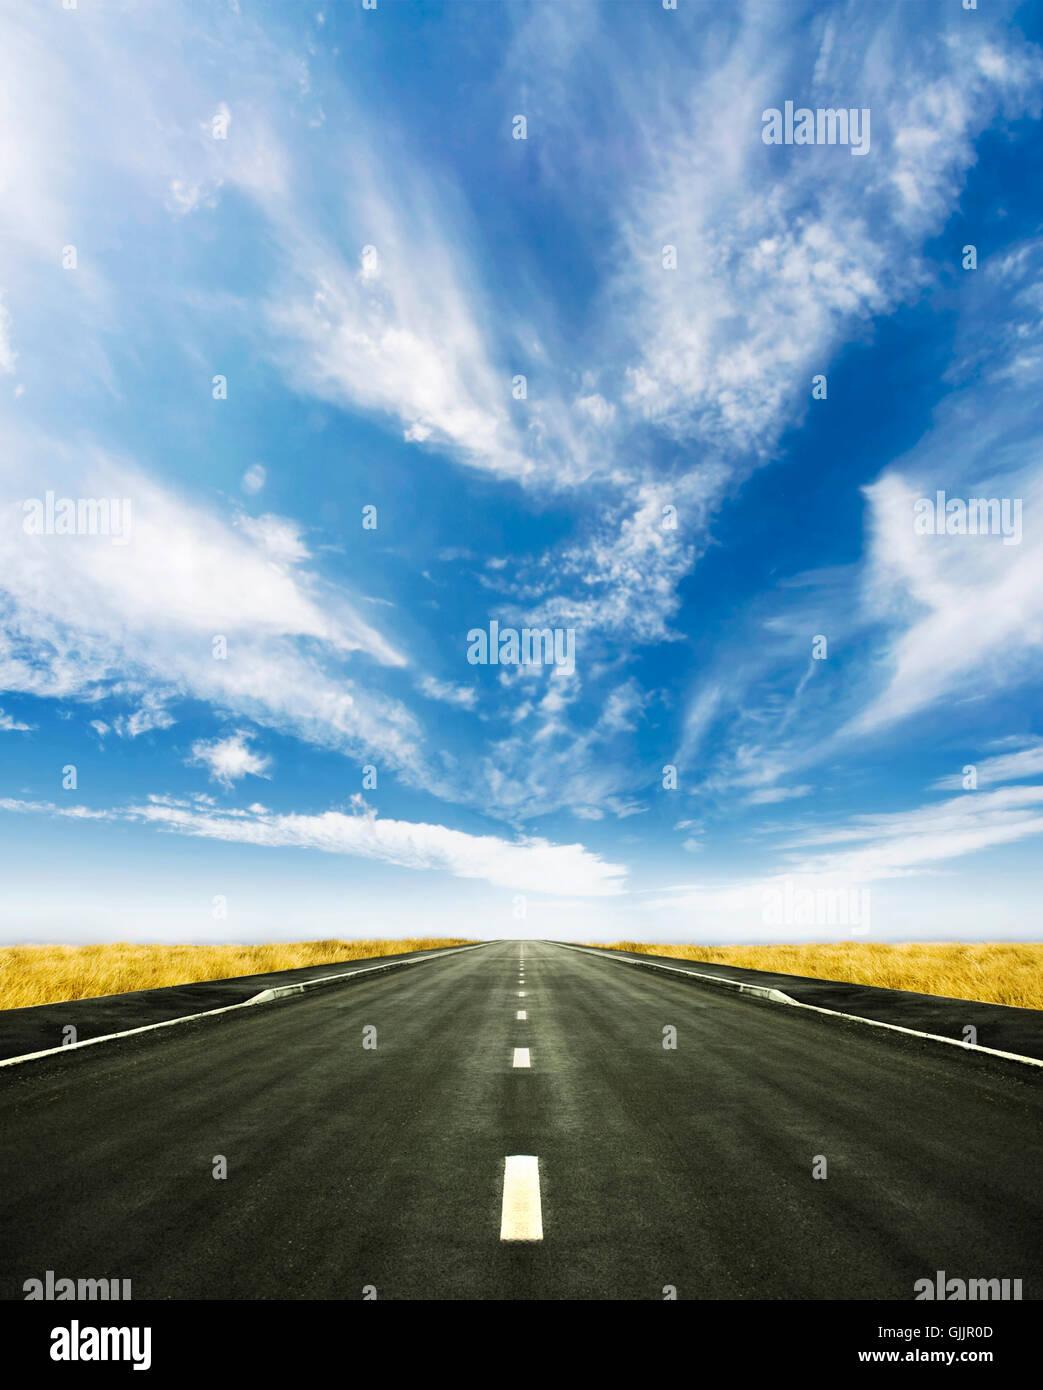 horizon road firmament - Stock Image